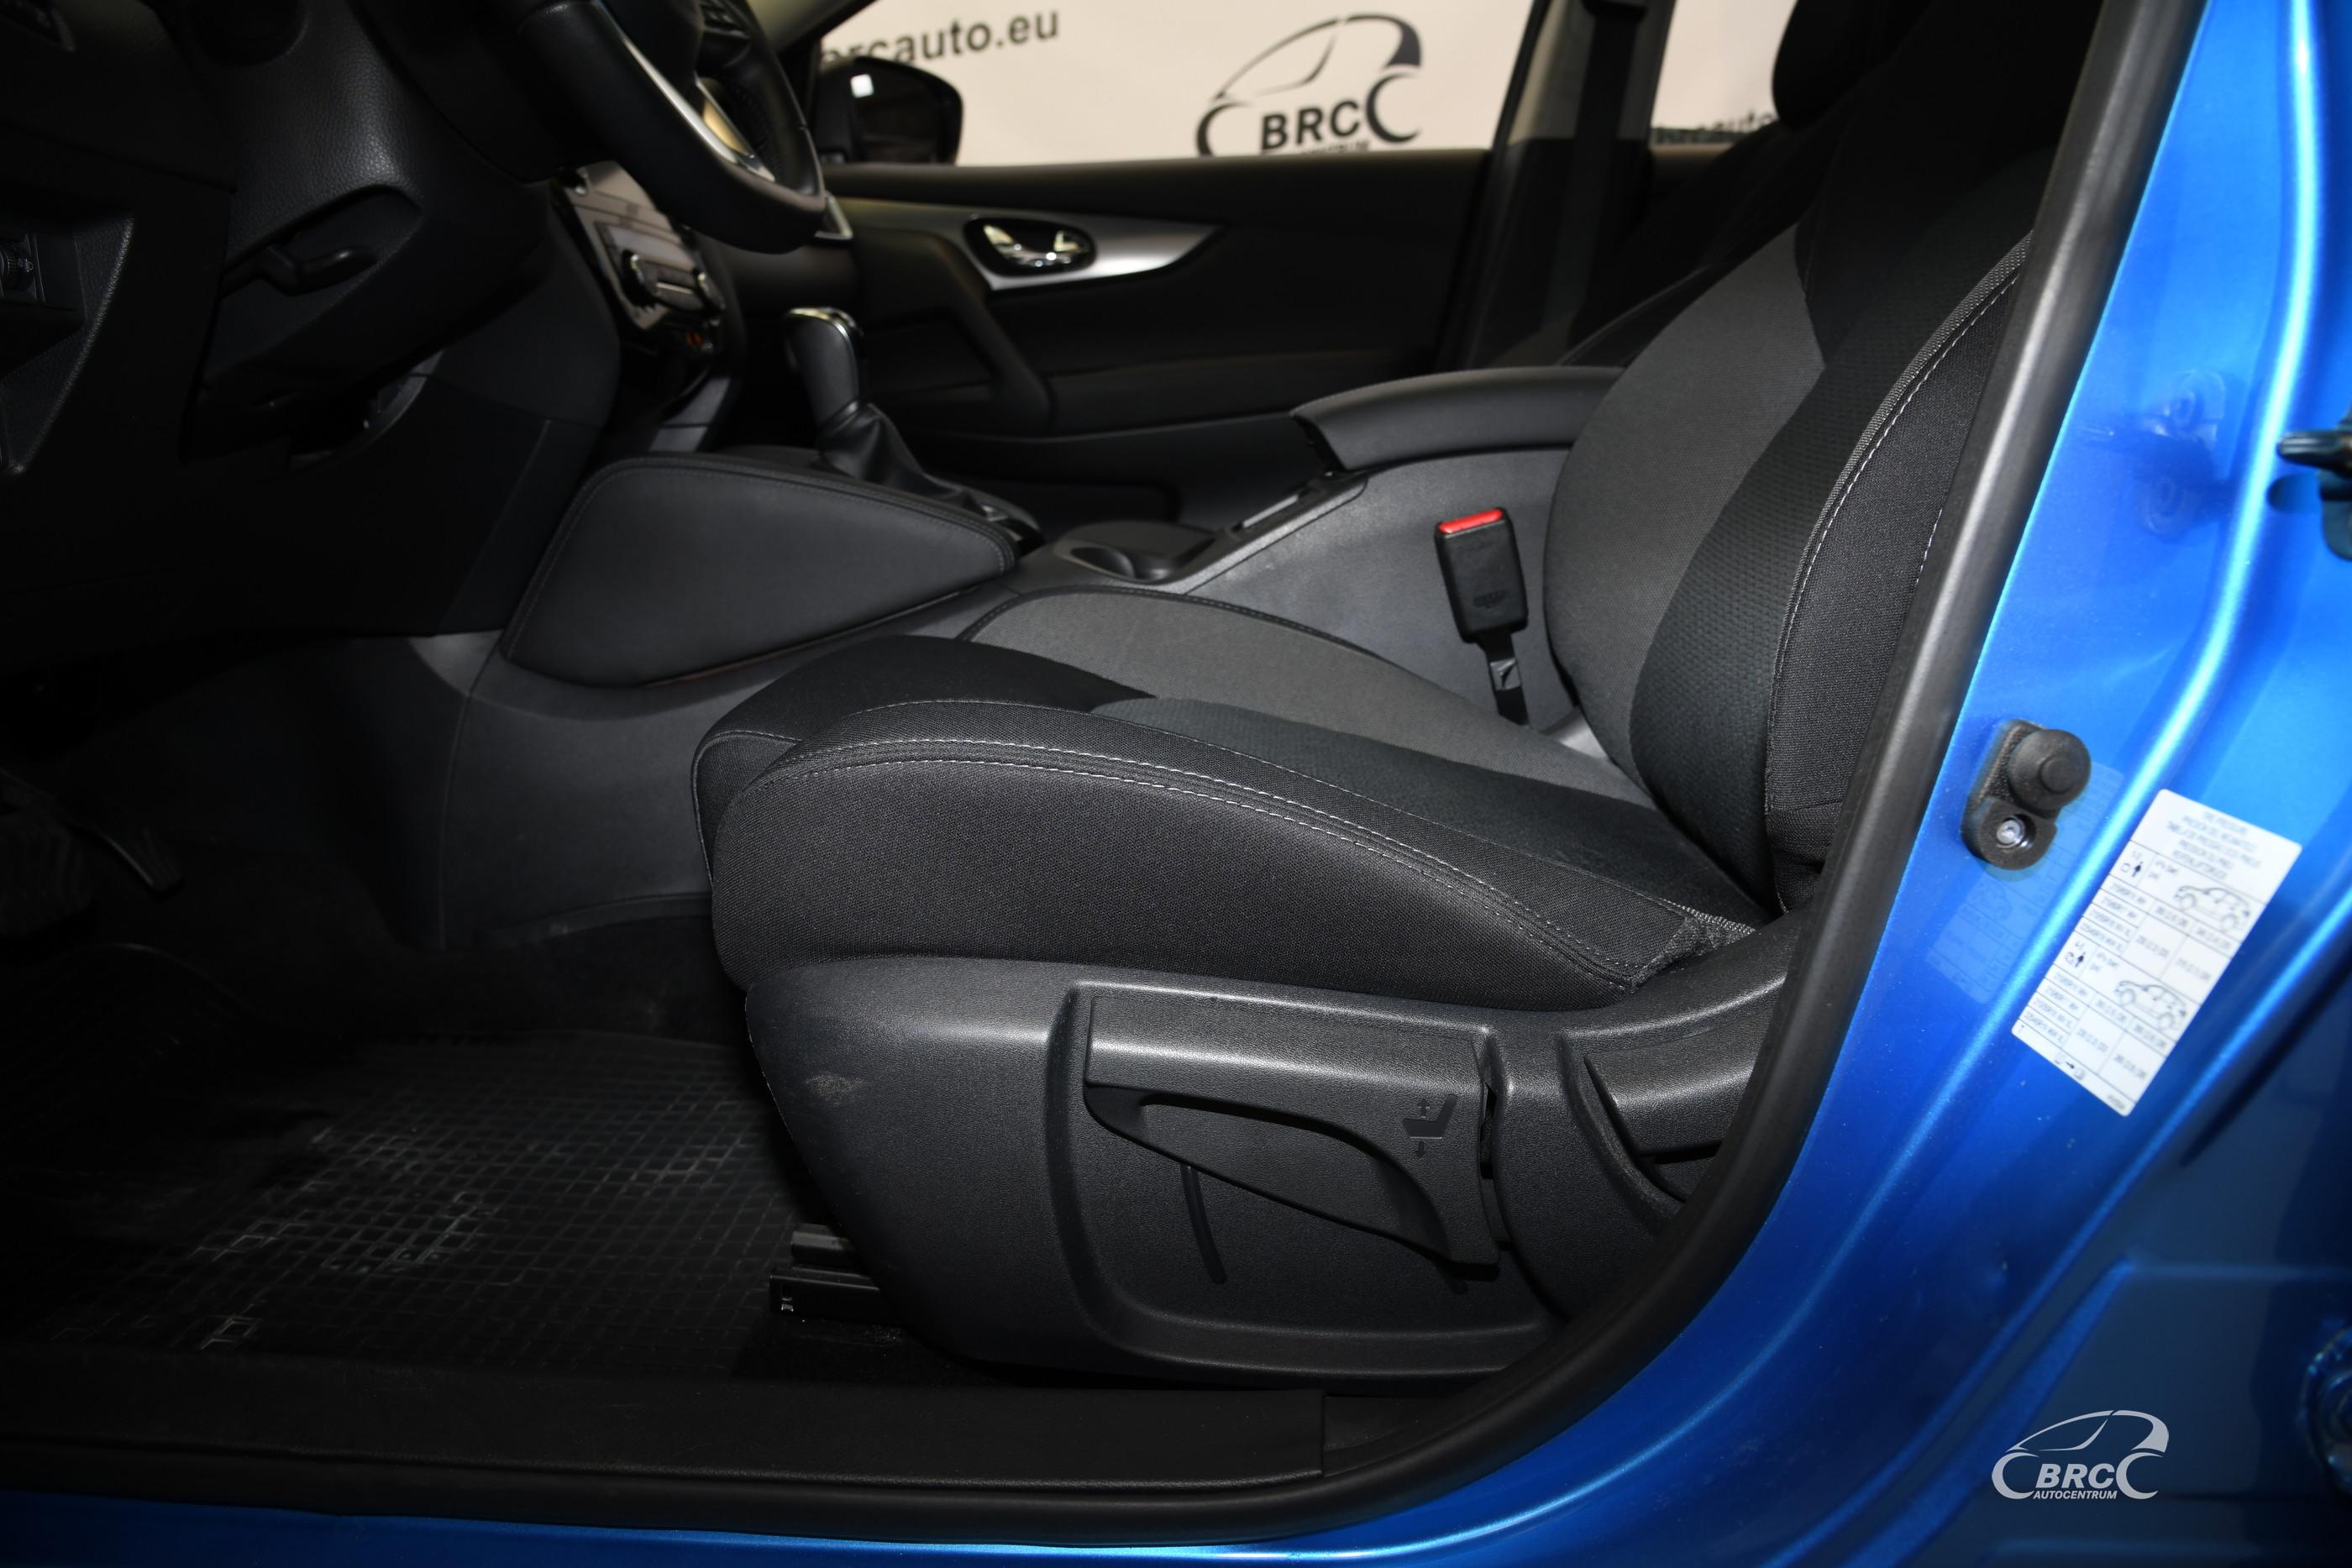 Nissan Qashqai 1.3 DIG-T Automatas